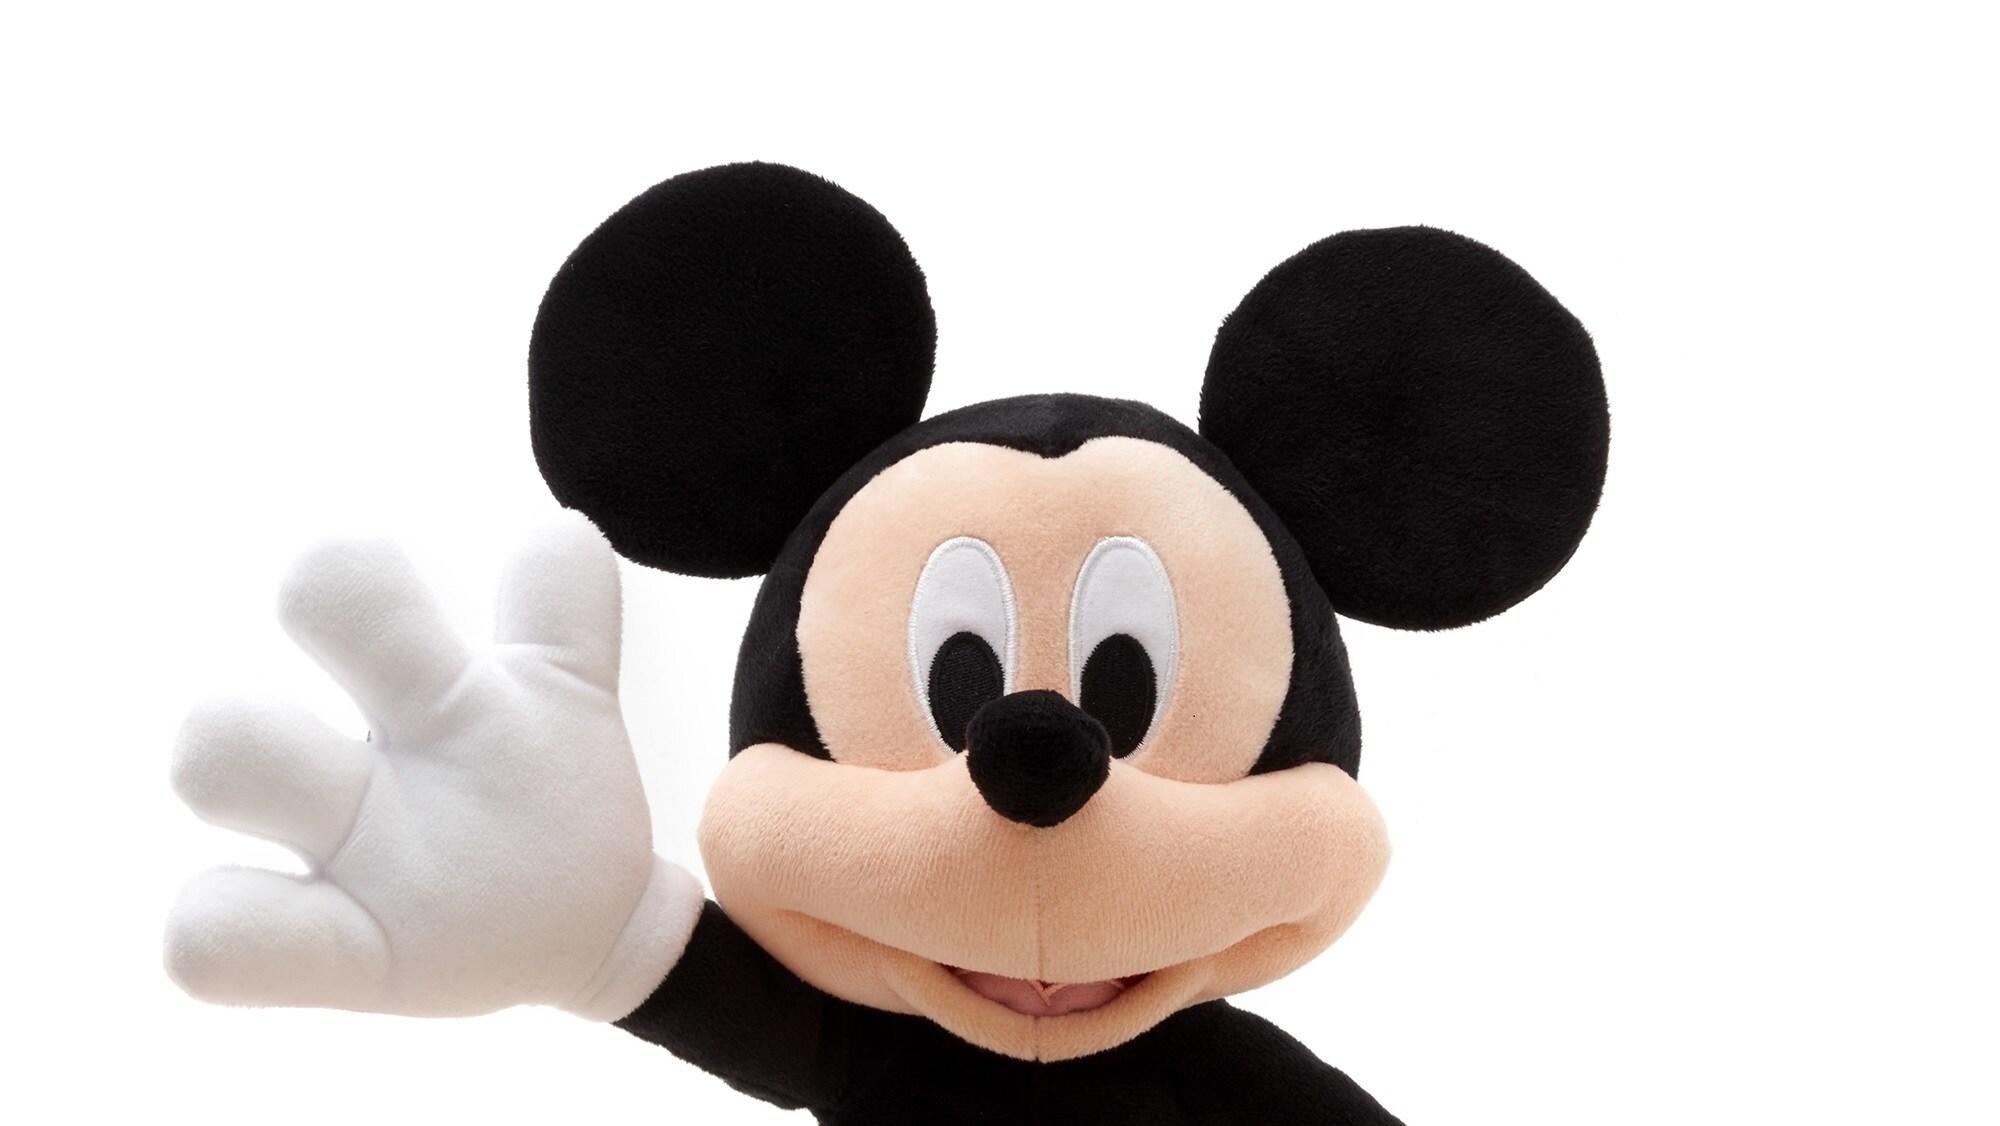 International Friendship Day - Mickey Mouse plush